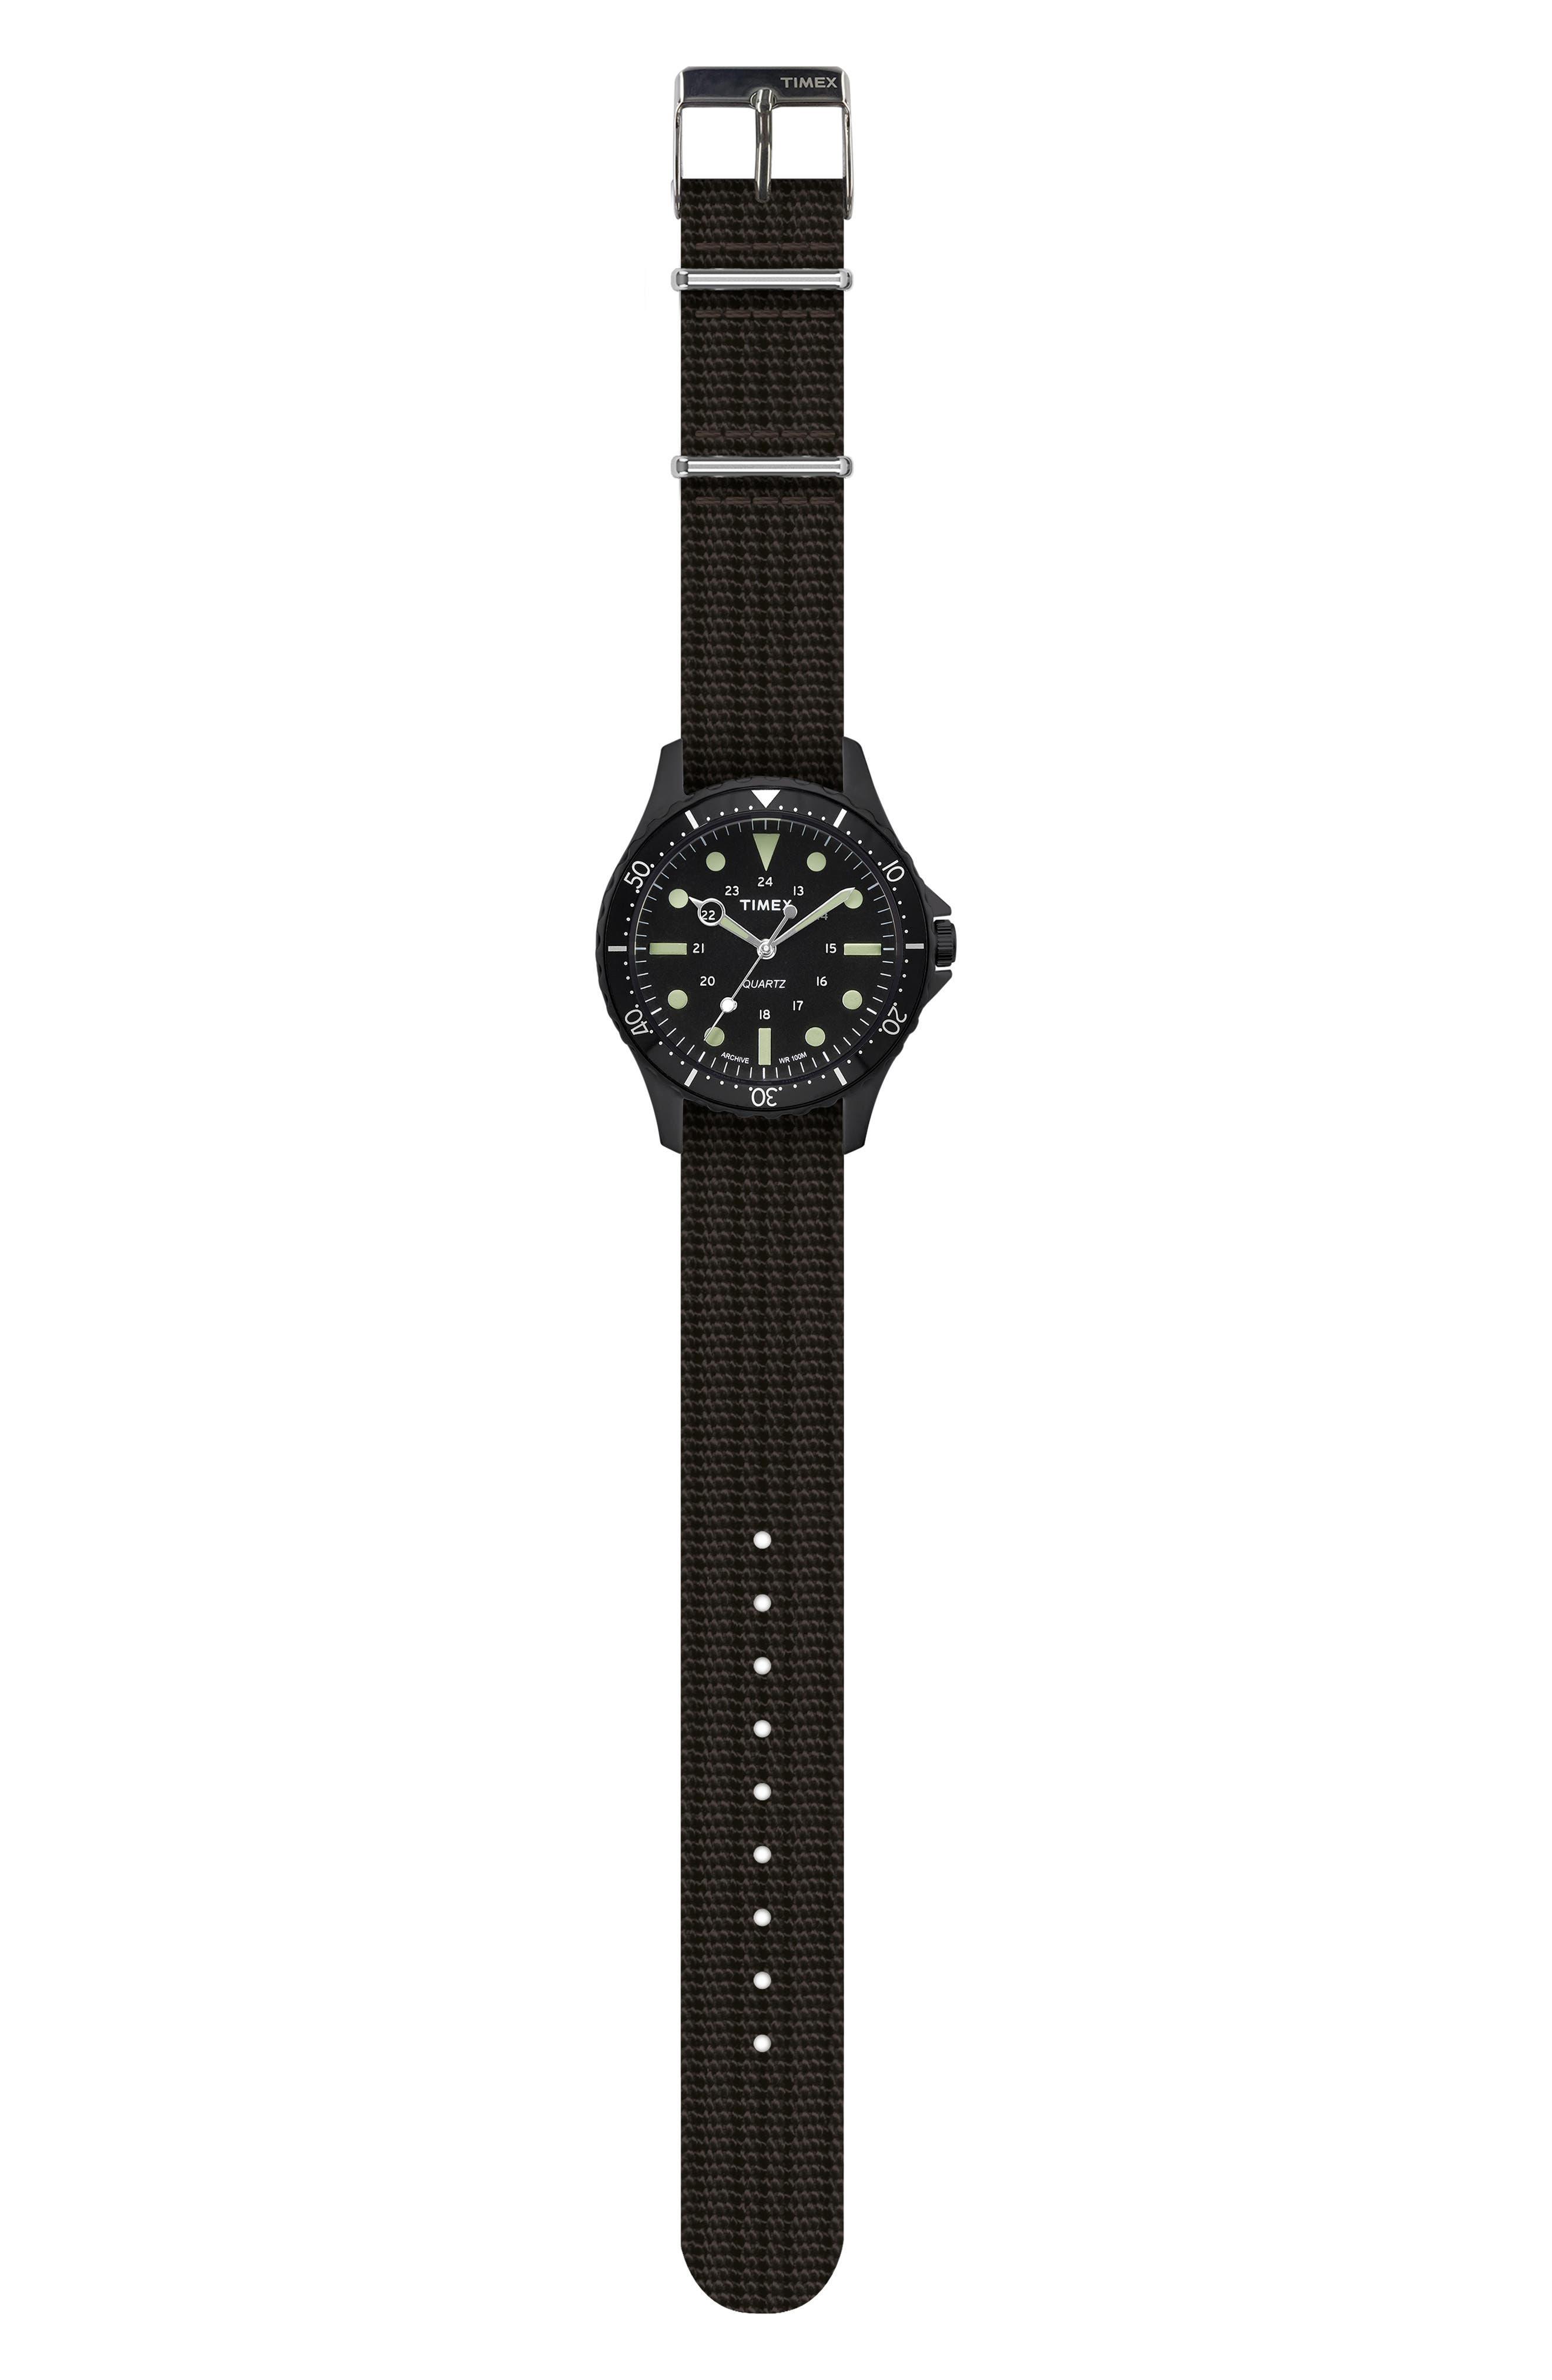 Timex<sup>®</sup> Navi Harbor NATO Strap Watch, 38mm,                             Alternate thumbnail 2, color,                             BLACK